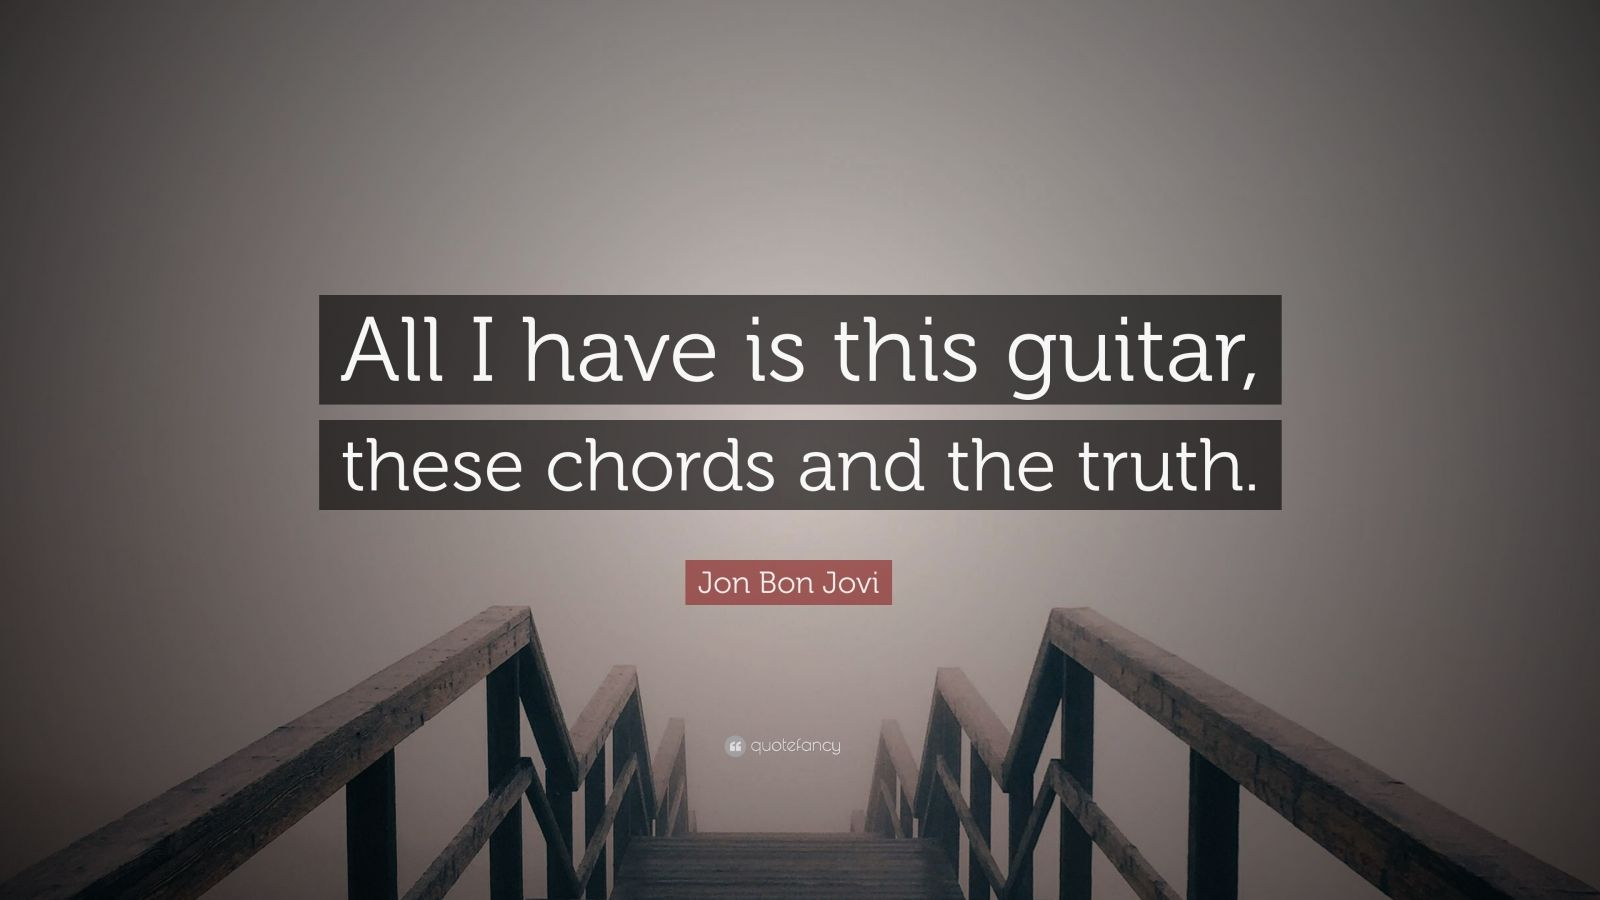 Jon Bon Jovi Quotes 94 Wallpapers Quotefancy